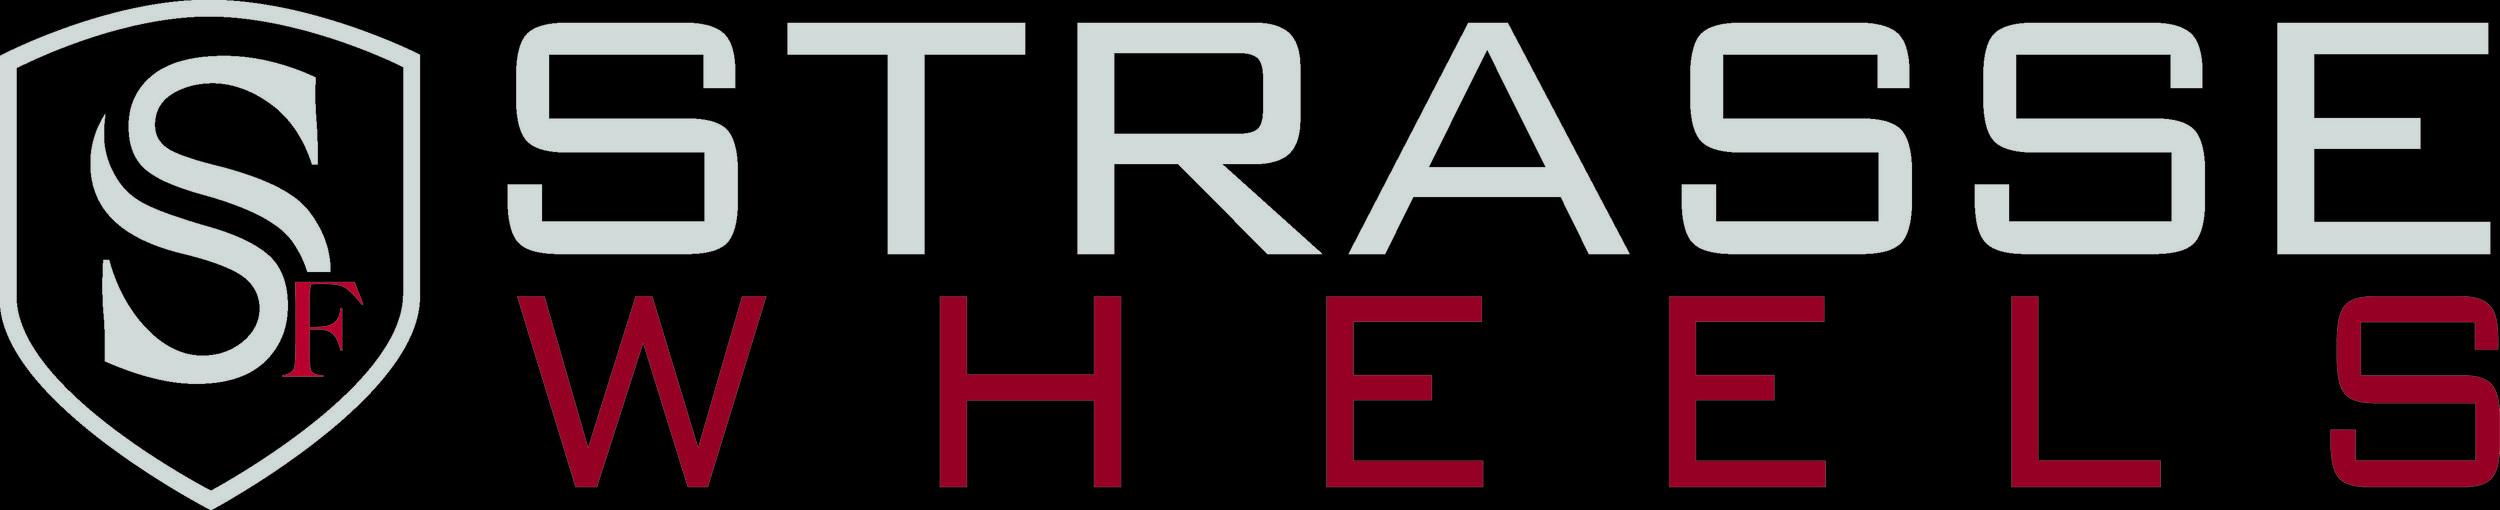 STRASSE-Horizontal-BlackRed.jpg